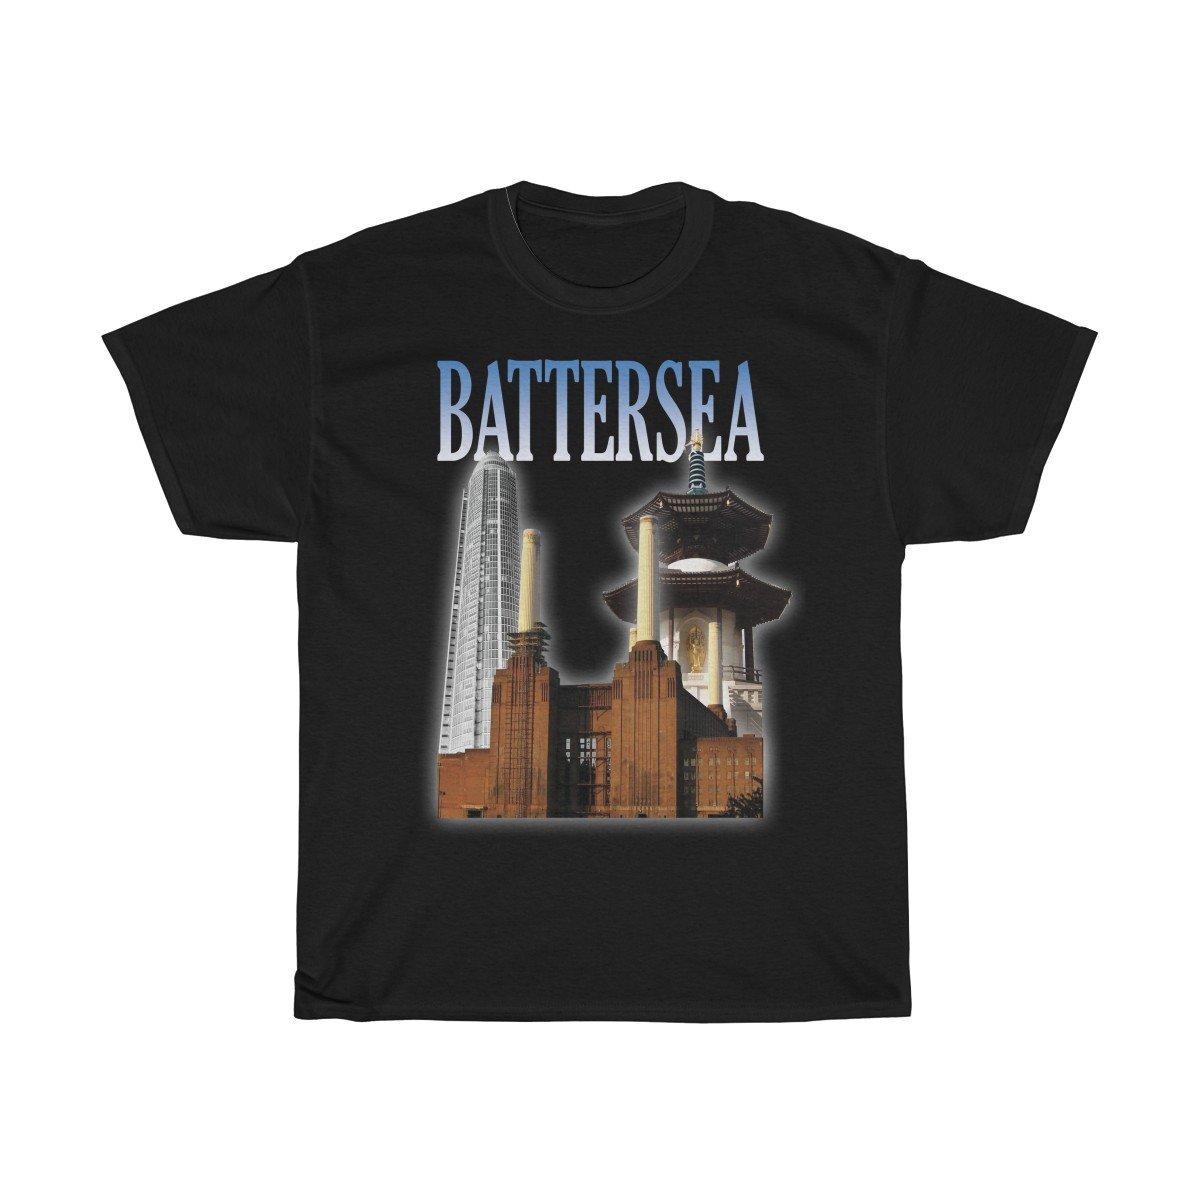 Battersea 90s Style Unisex T-Shirt -